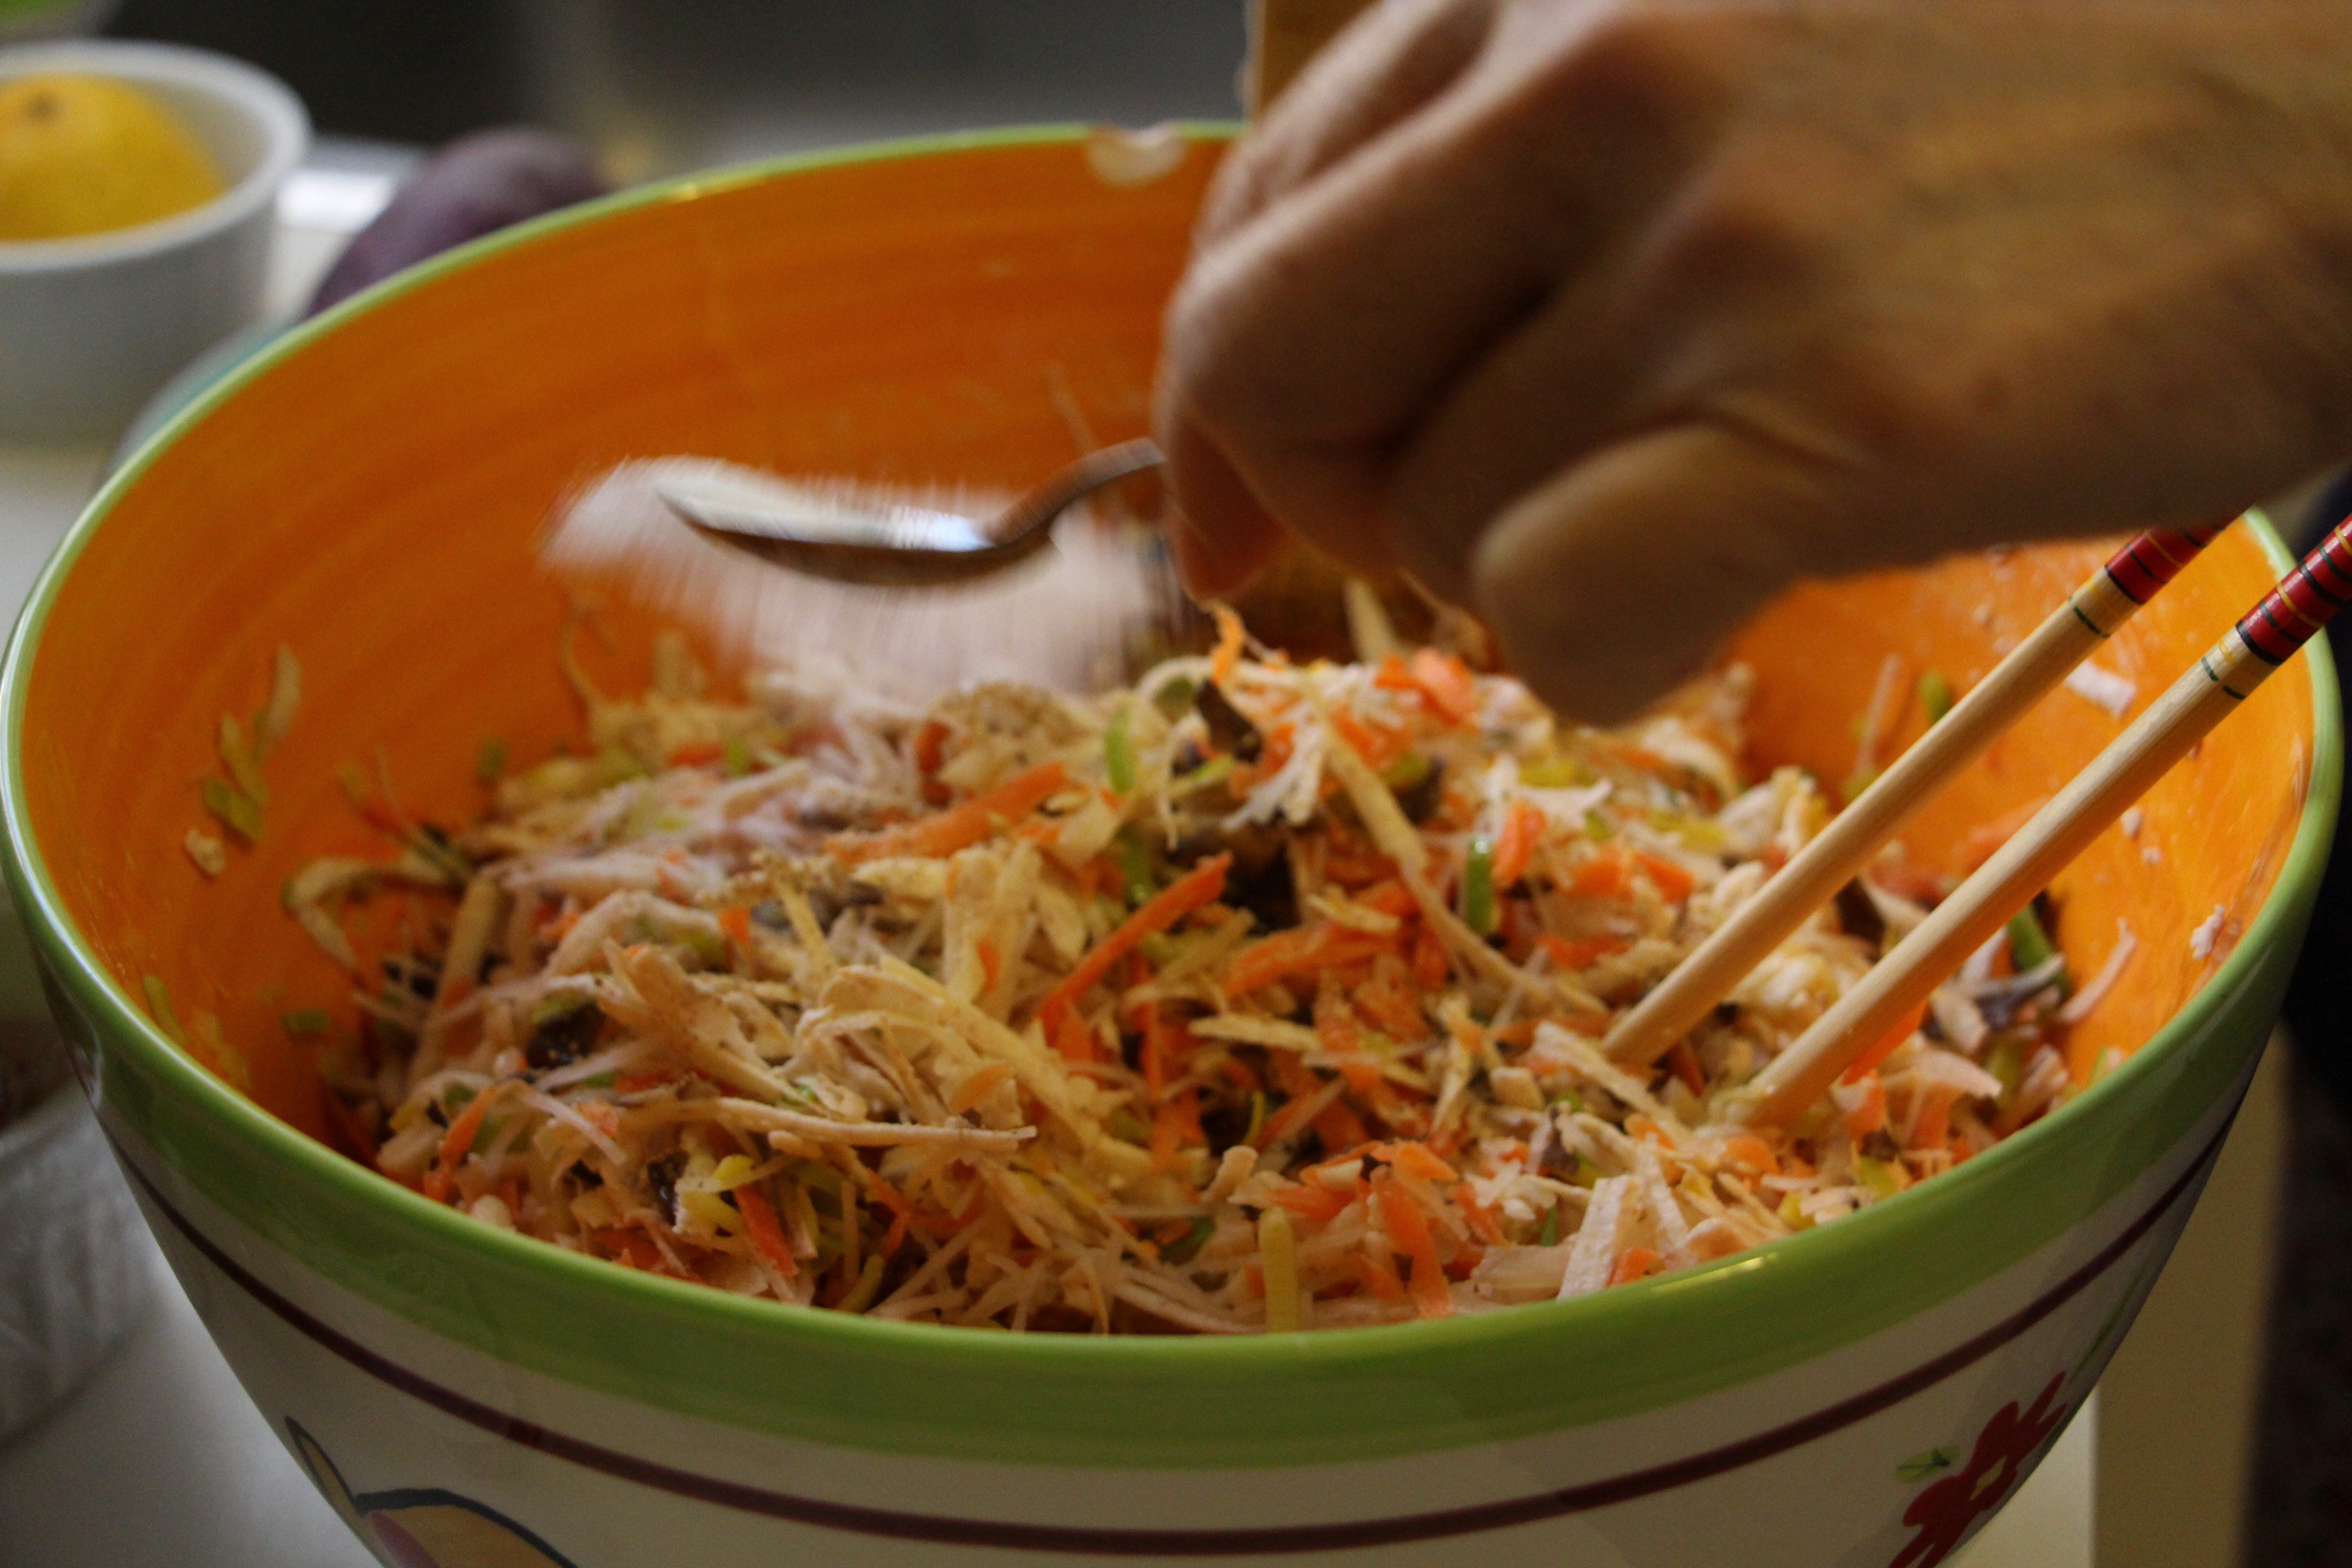 Vietnamese Recipe: Chia Gio, fried rolls – My Lighthearted Kitchen